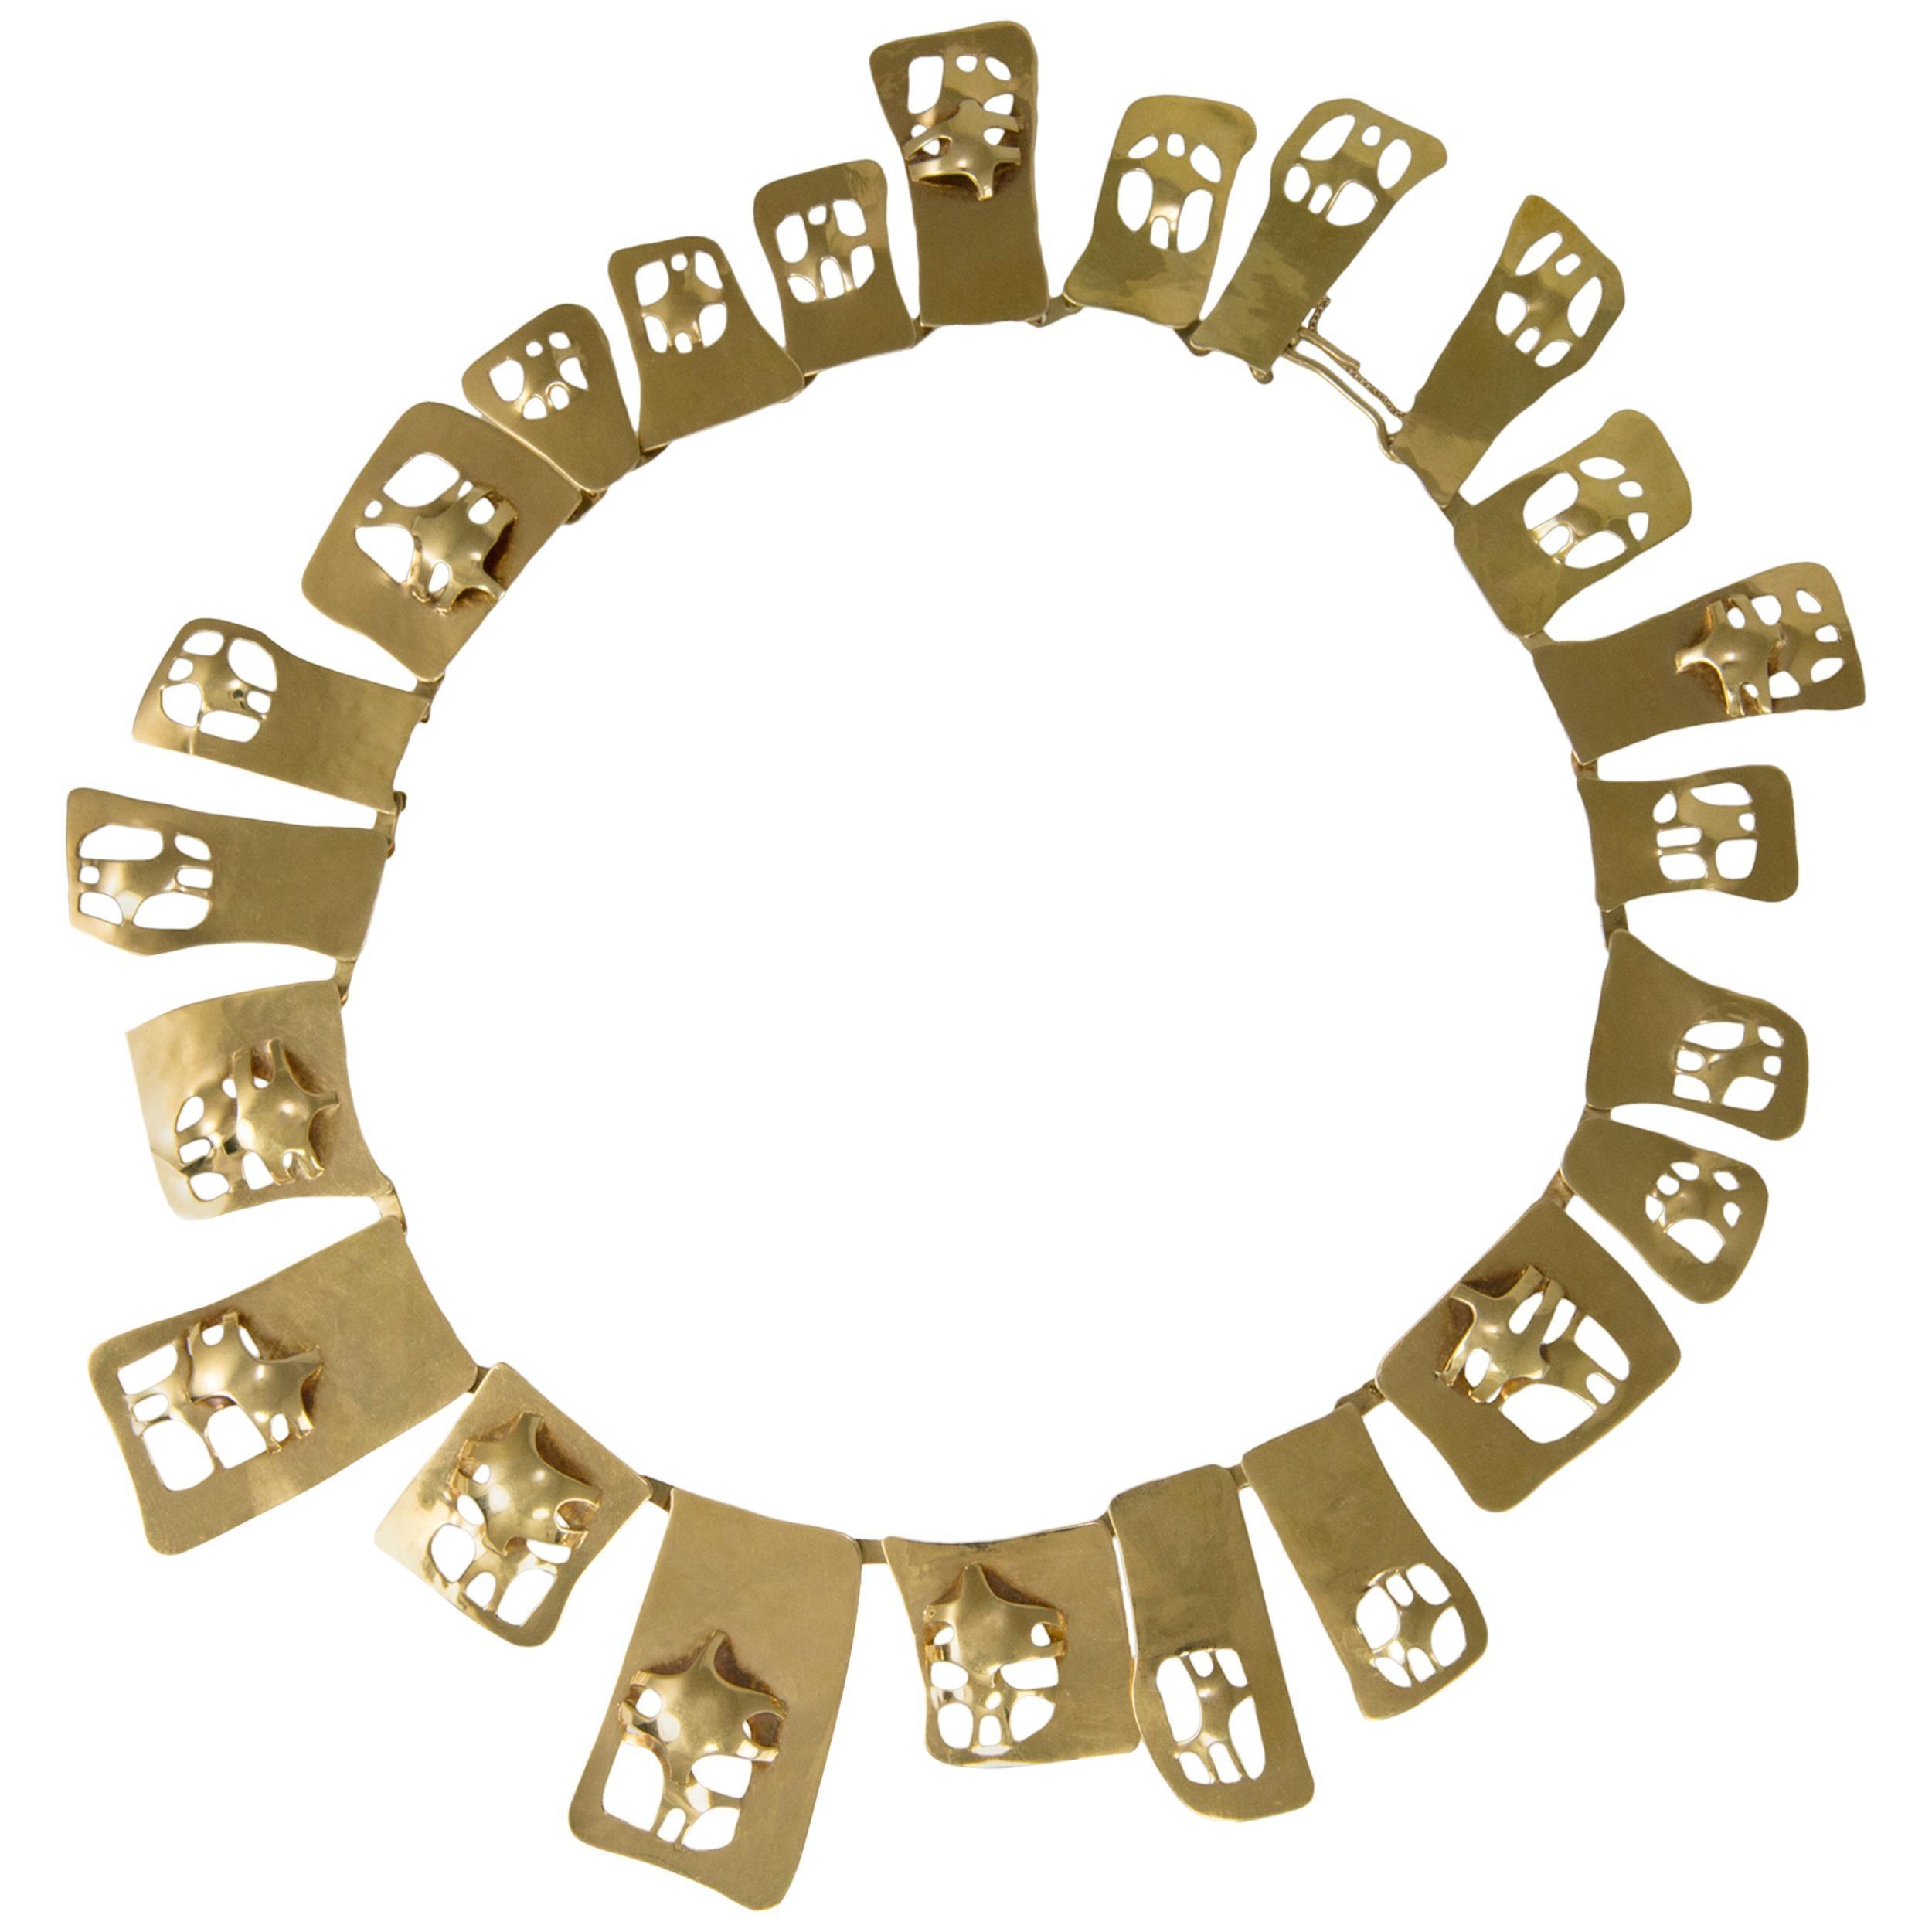 c. 1980 Dutch C.Y. Noomen Gold Cut-Out Collar Necklace